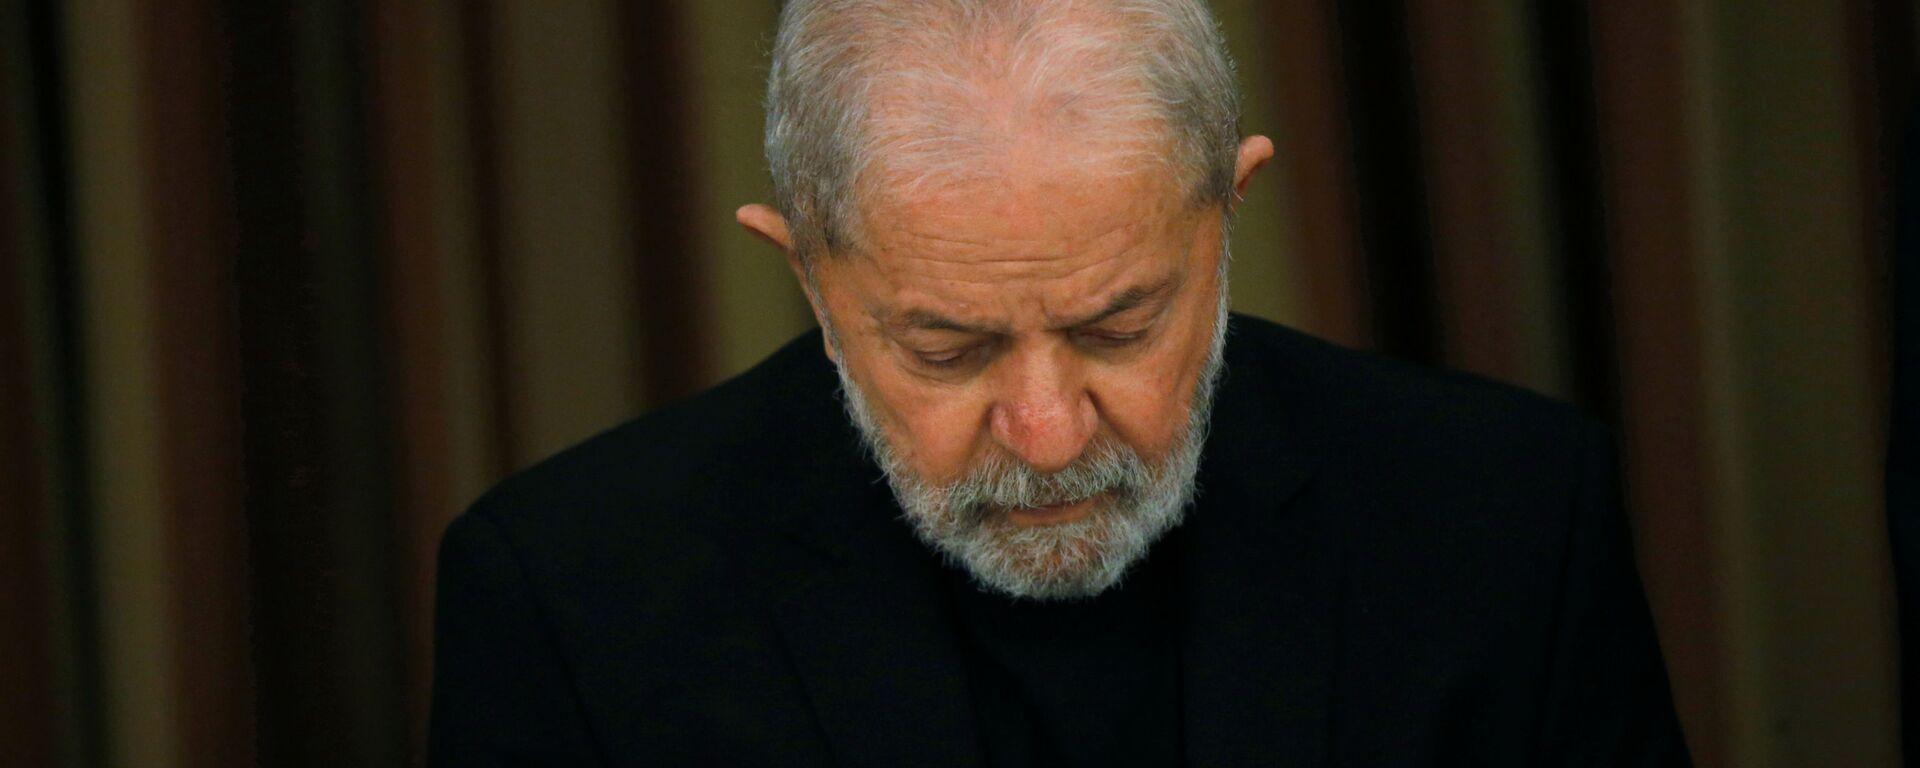 Luiz Inacio Lula da Silva, expresidente de Brasil - Sputnik Mundo, 1920, 10.03.2021